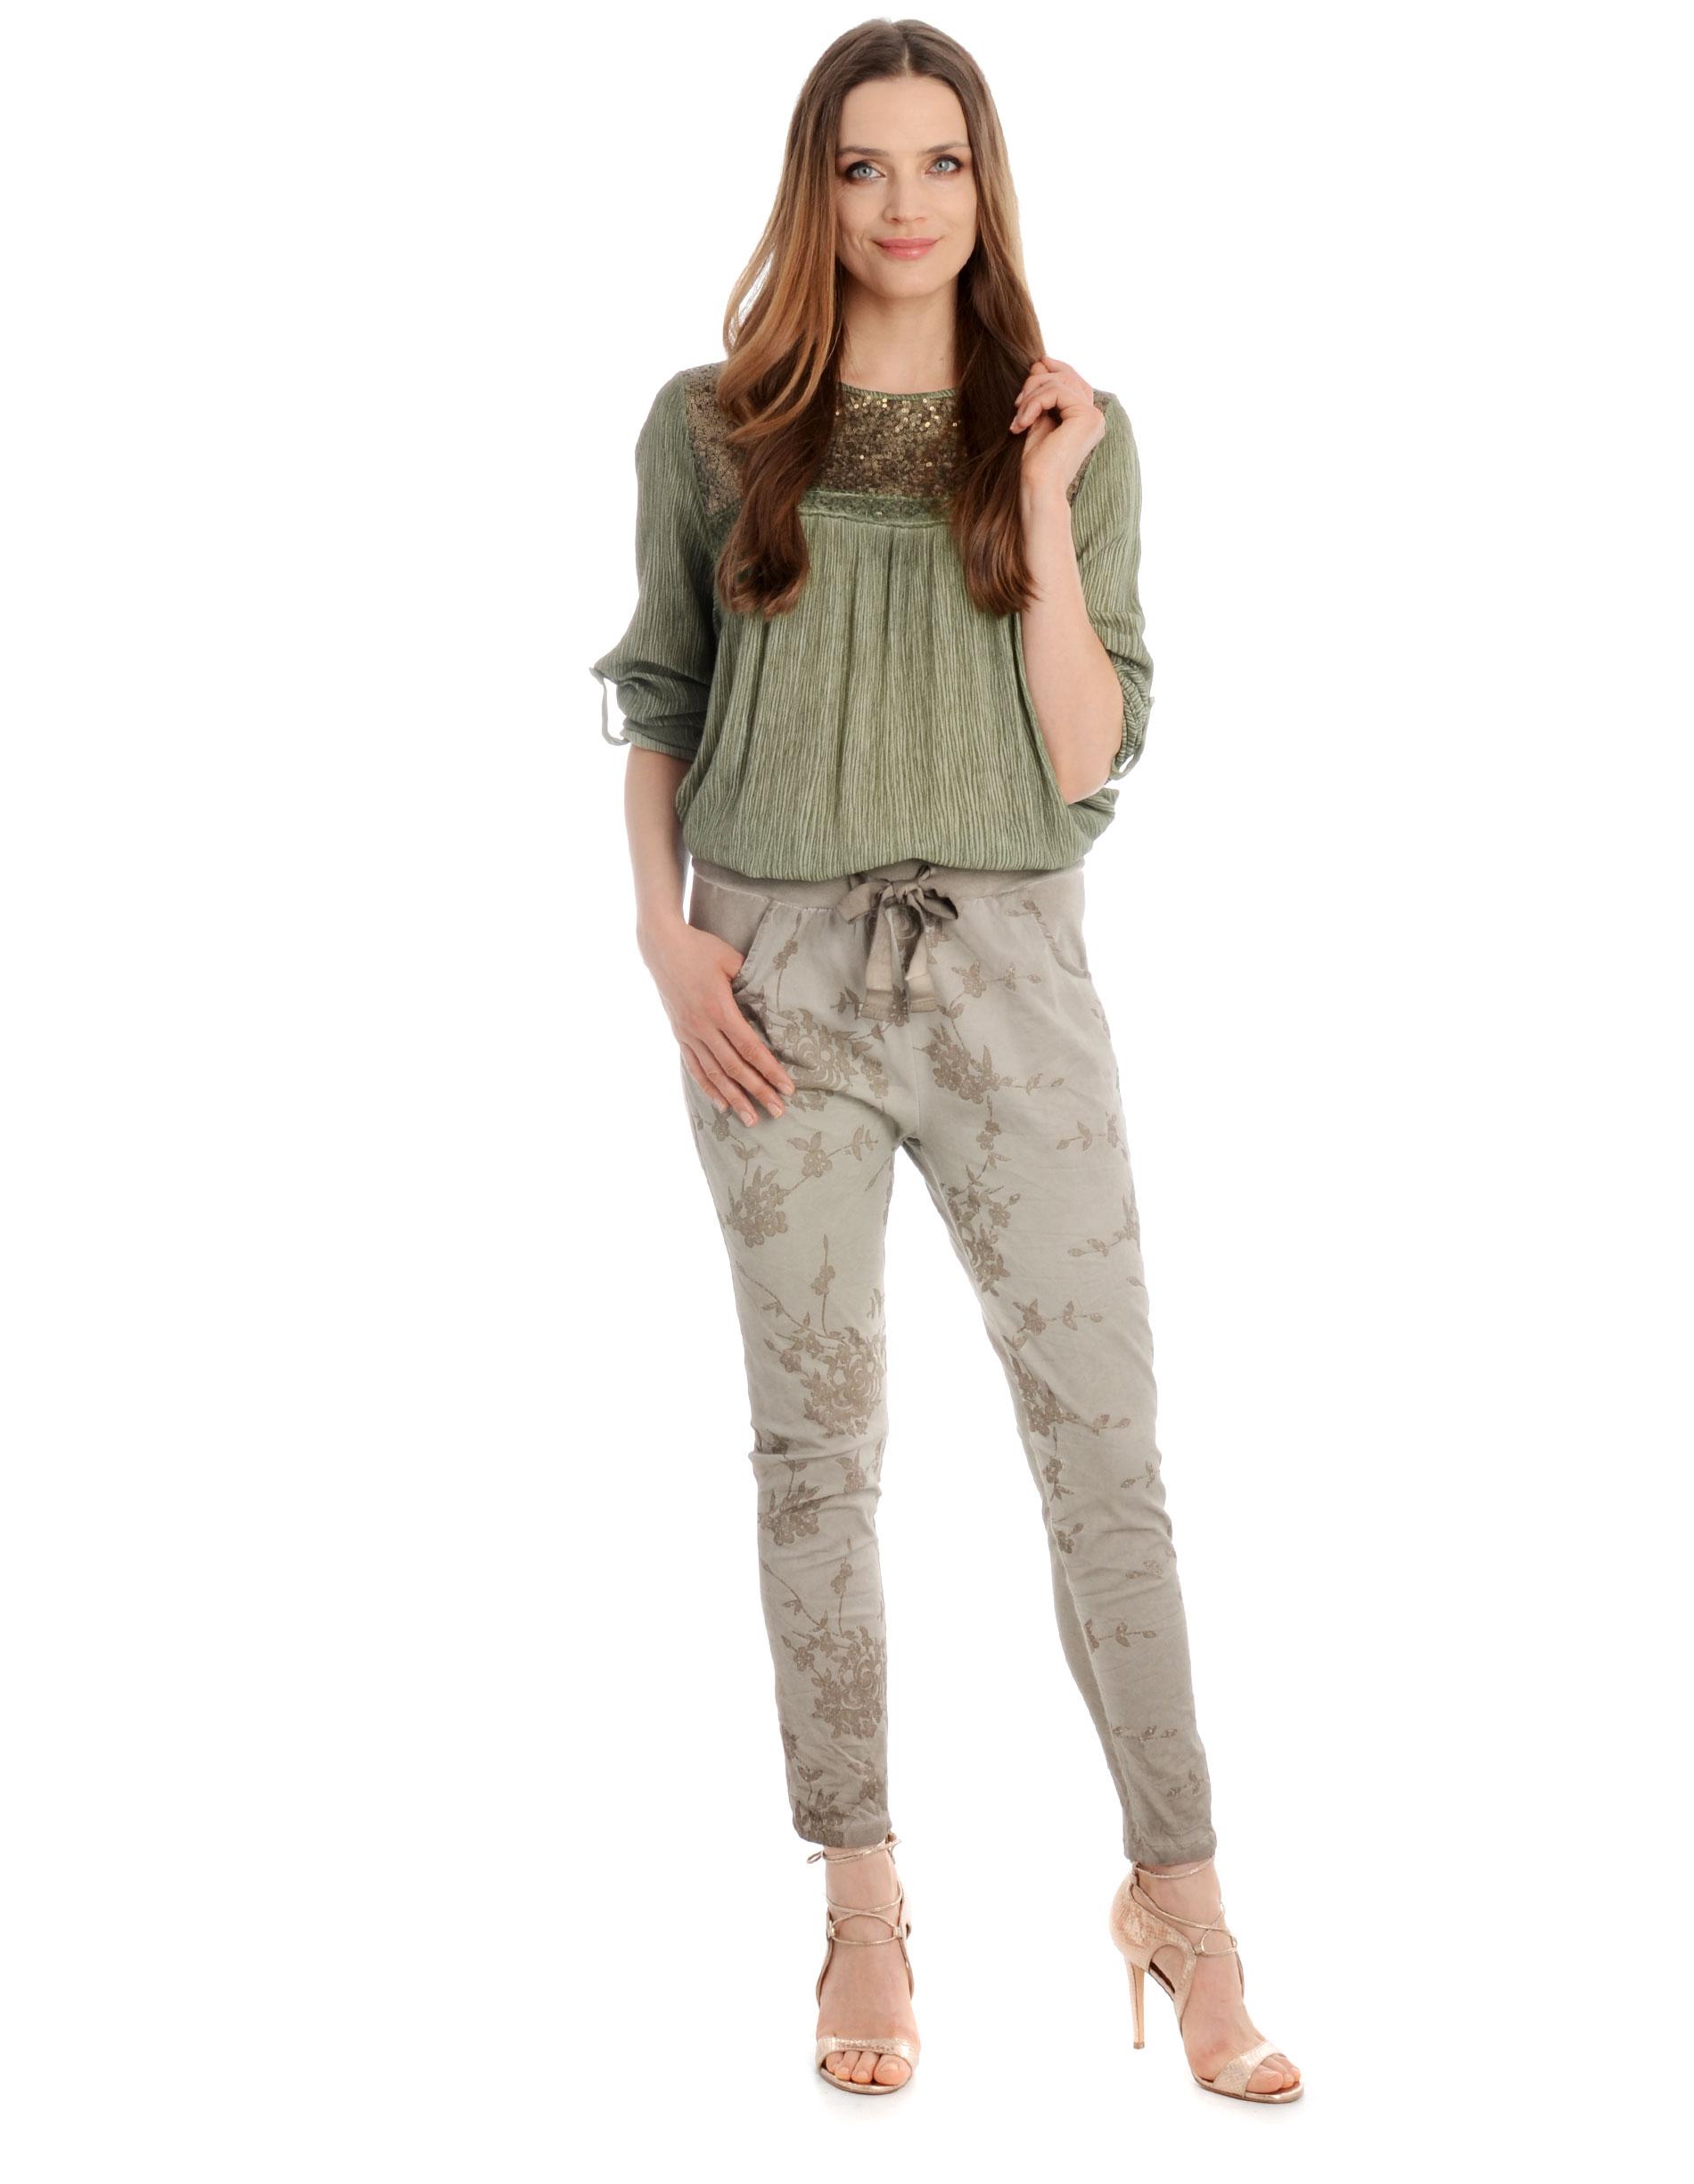 Spodnie - 19-17A05 FANG - Unisono